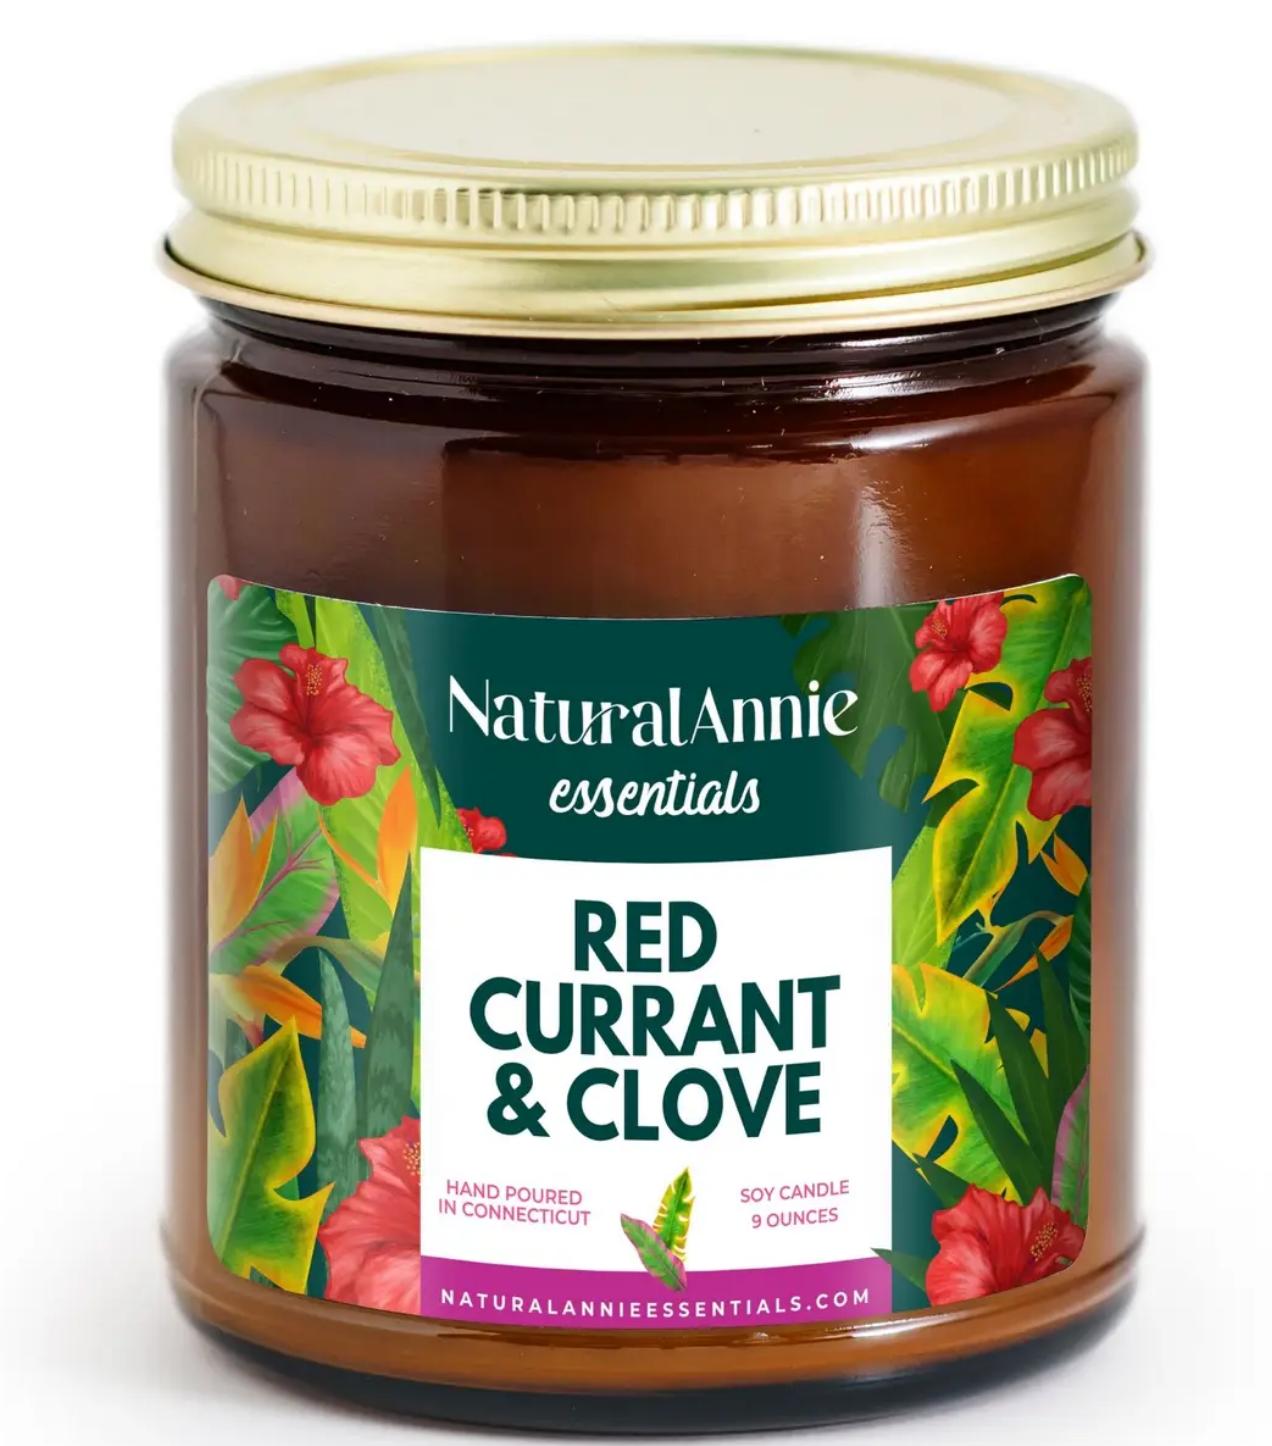 NaturalAnnie Essentials Red Currant&Clove Soy Candle-9oz